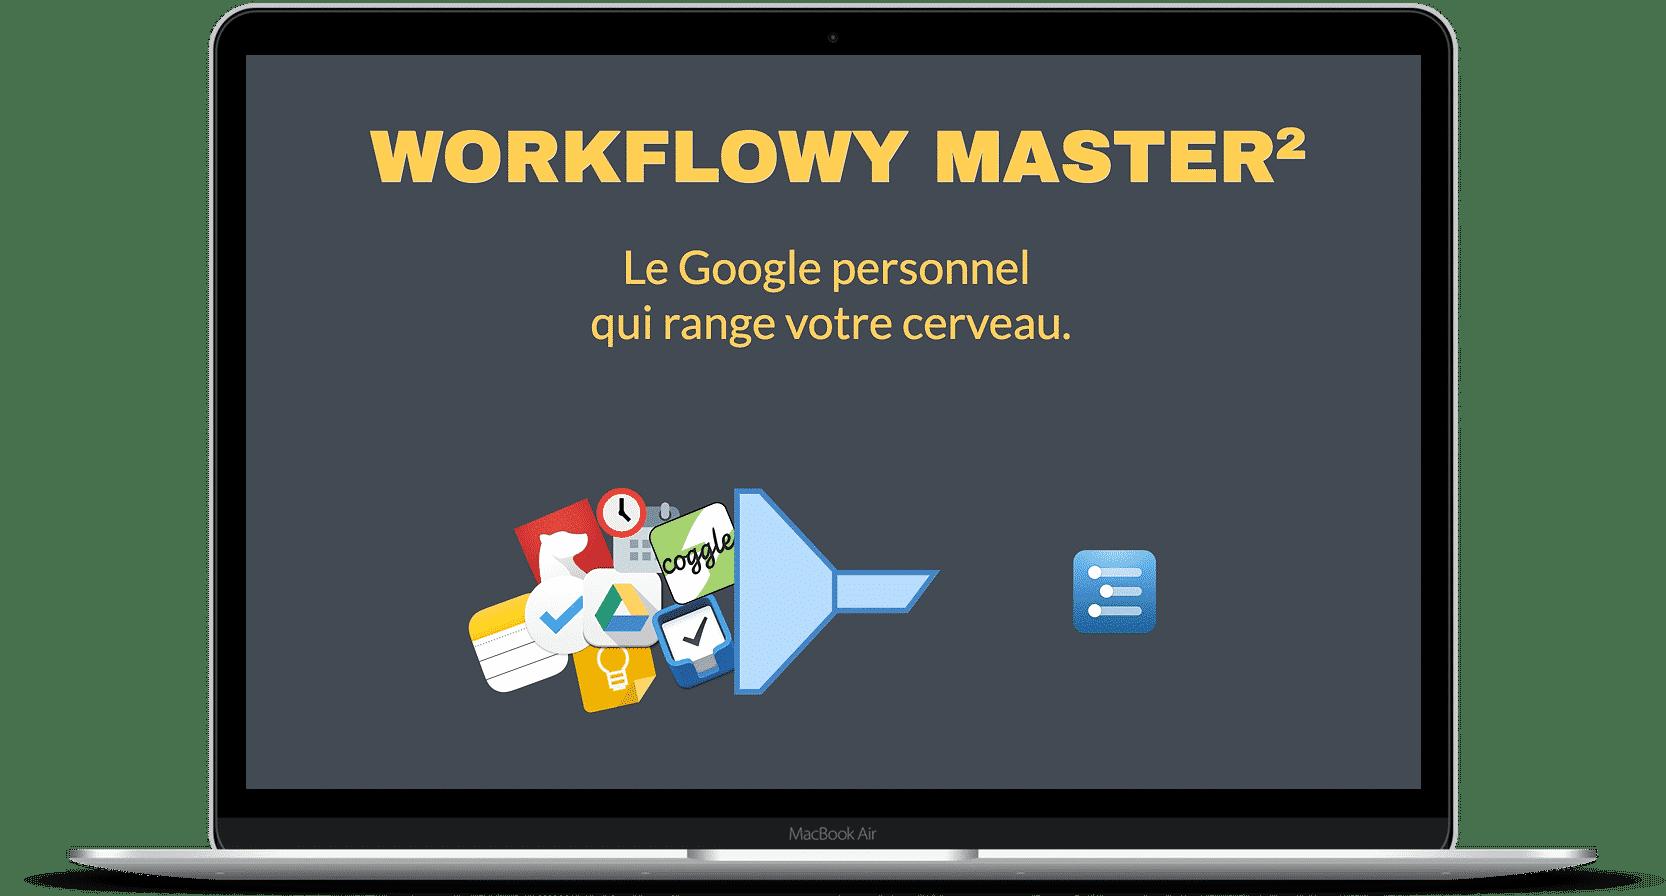 workflowy master 2